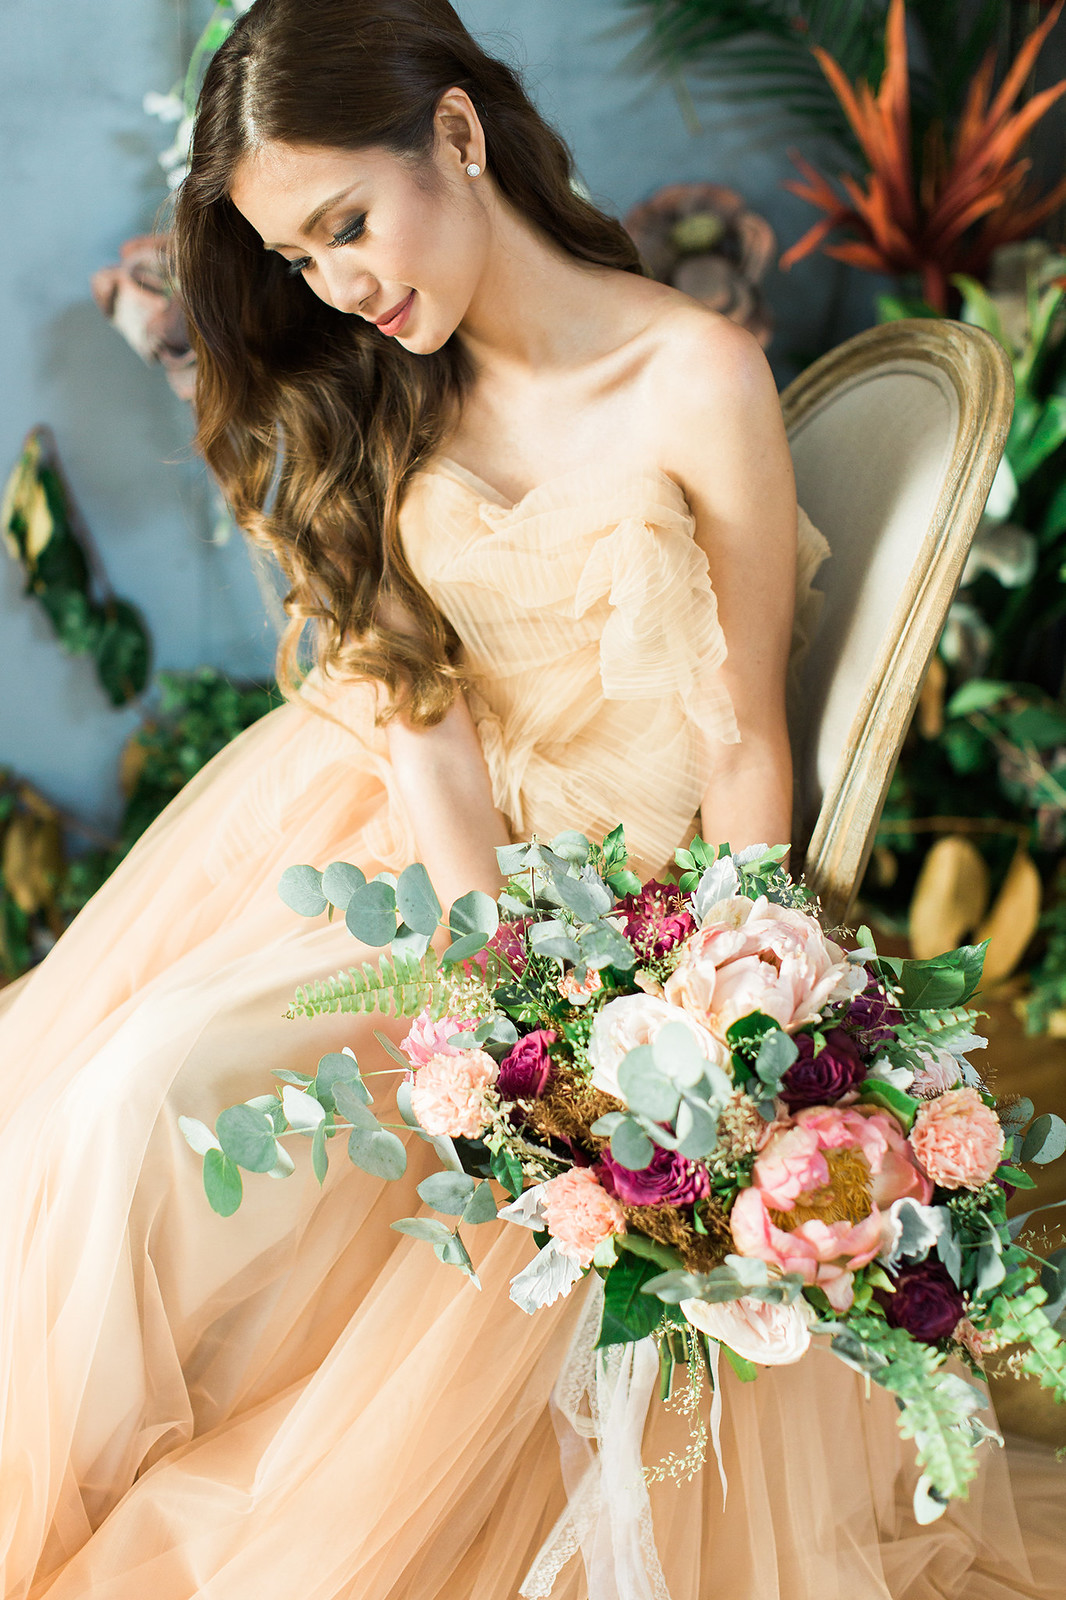 philippine wedding photographer 7